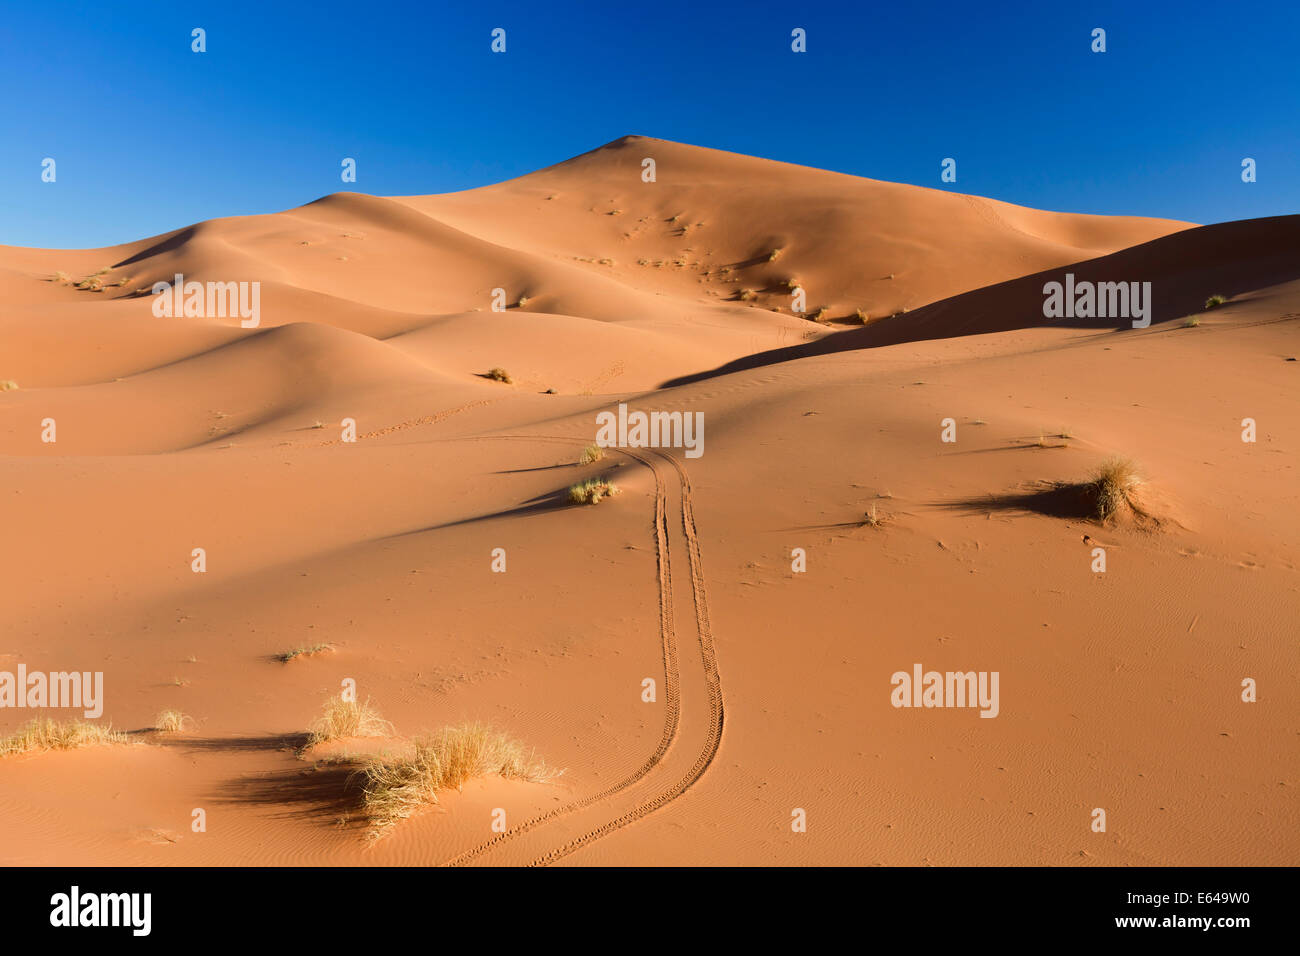 Dunes, Erg Chebbi, Sahara Desert, Morocco - Stock Image